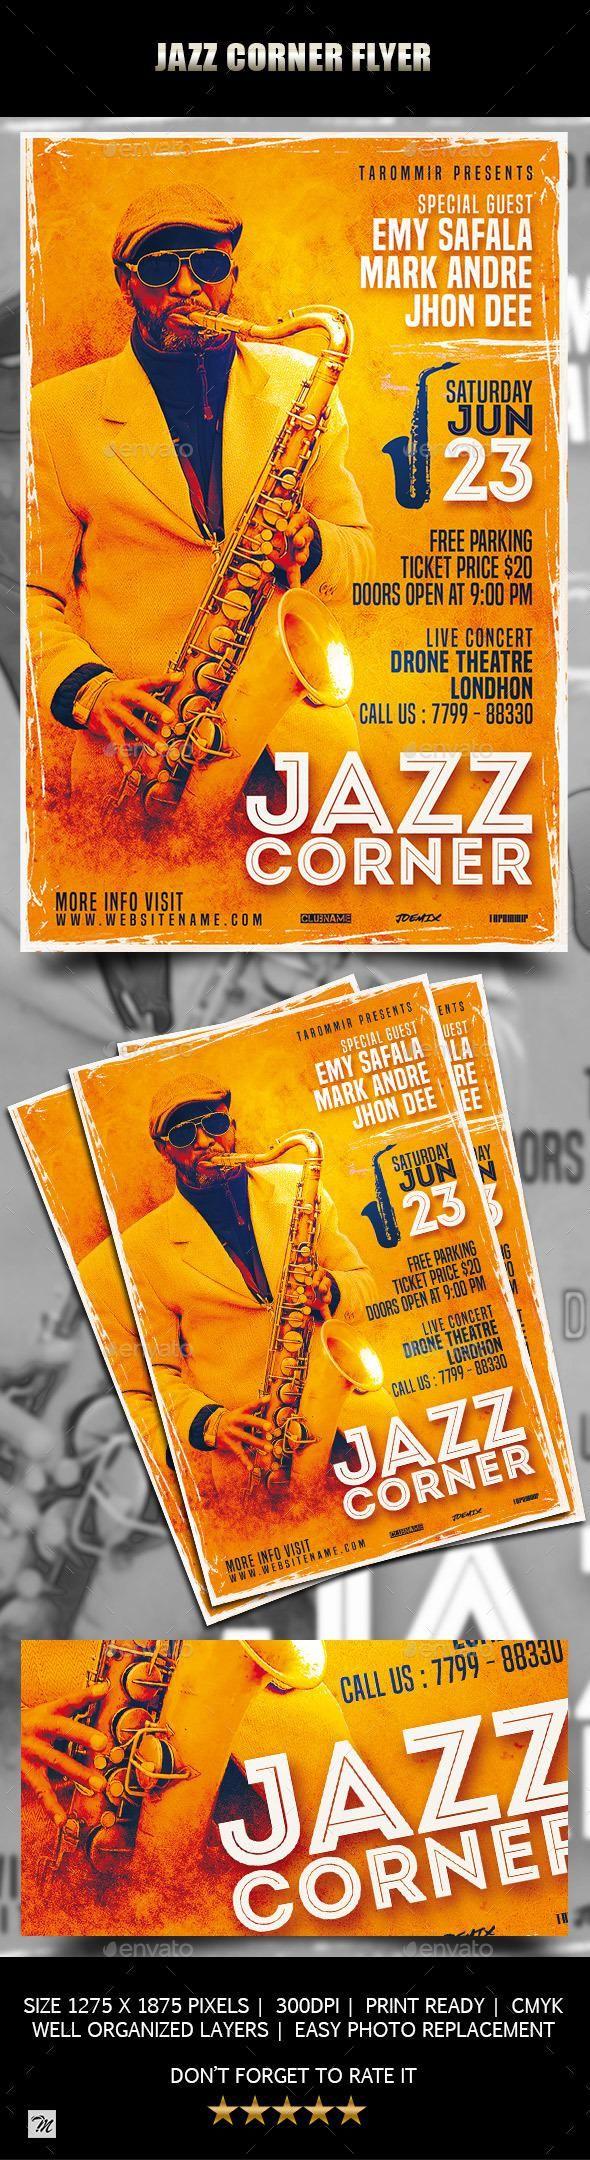 Jazz Corner Flyer BestDesignResources Free psd flyer